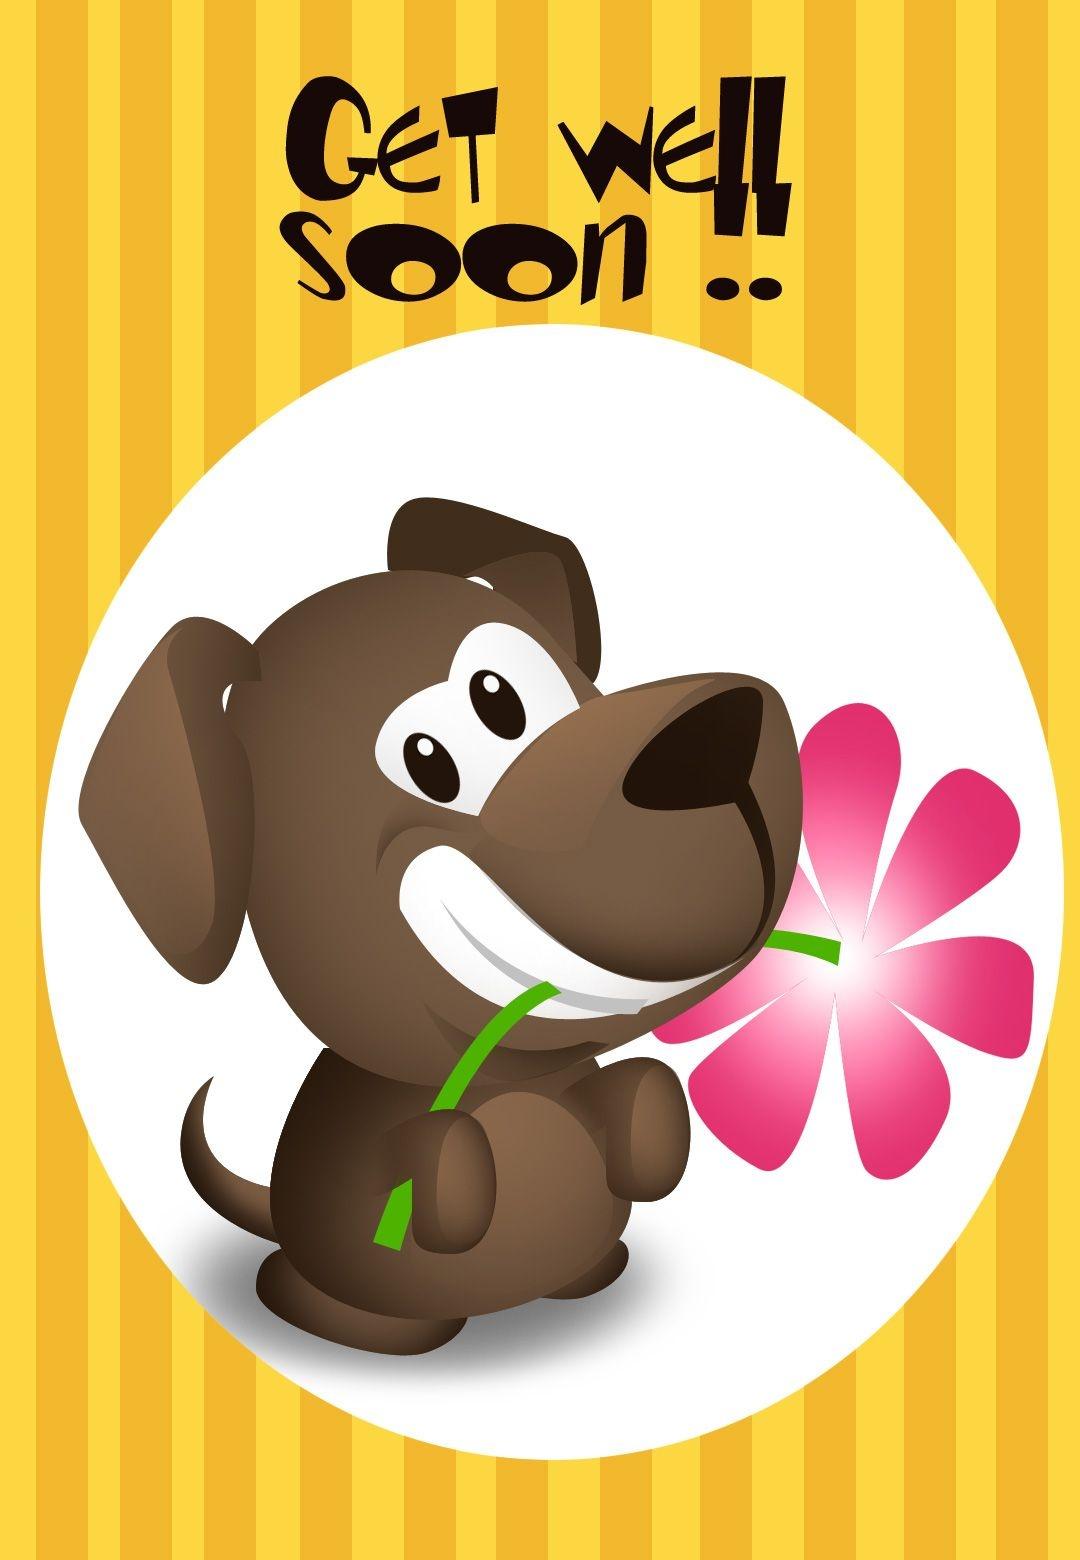 Get Well Soon Puppy Greeting Card | * Prenten 18/ Beterschap - Sterkte * - Free Printable Get Well Cards